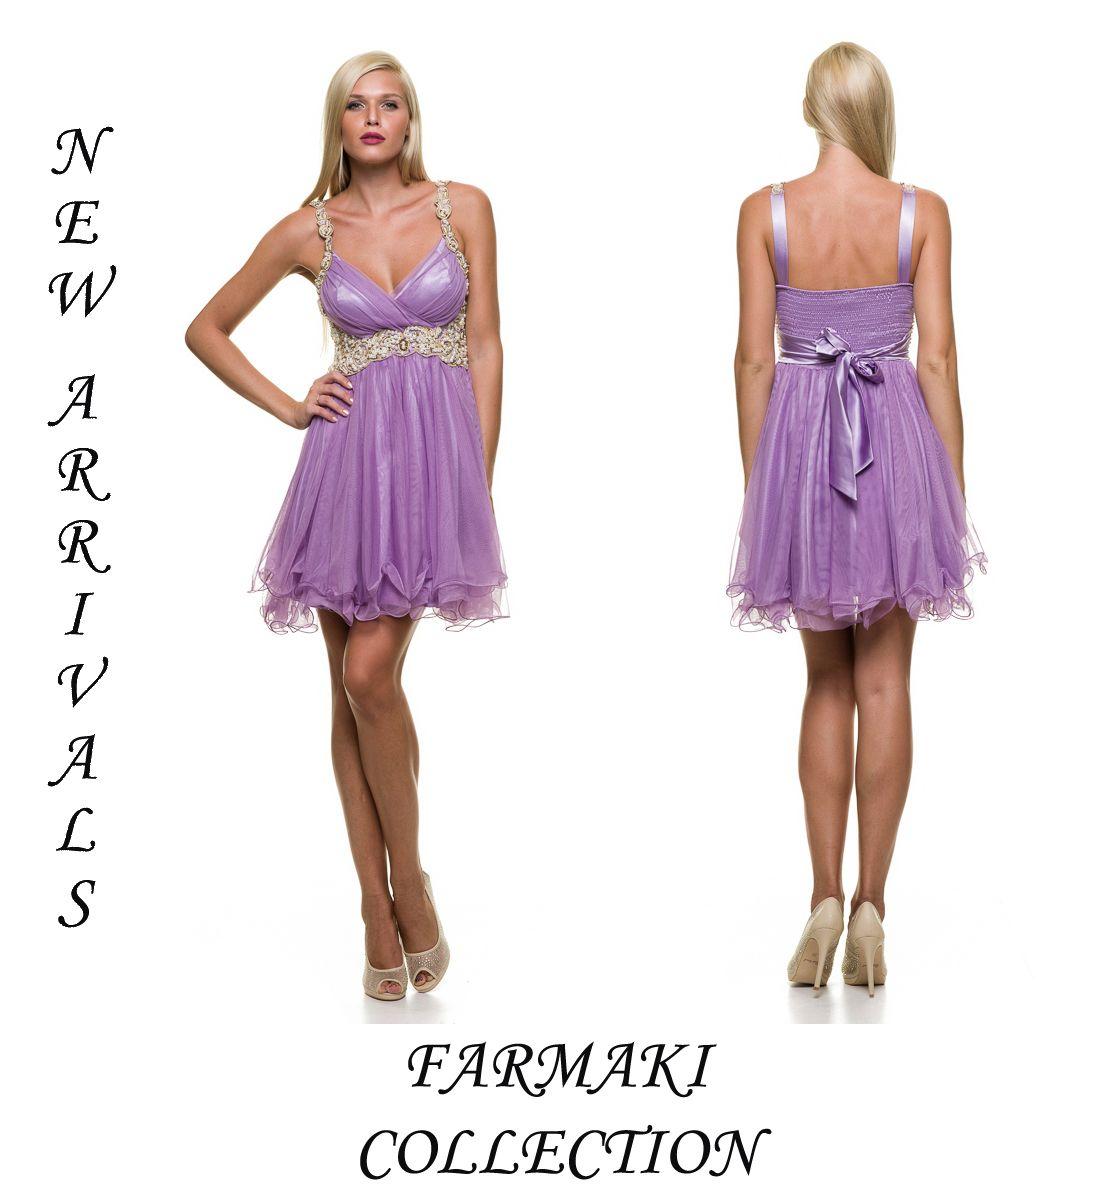 fccf232dea59 Φόρεμα κοντό με ράντες κεντημένες. Κέντημα κάτω από το στήθος. Ύφασμα τούλι.